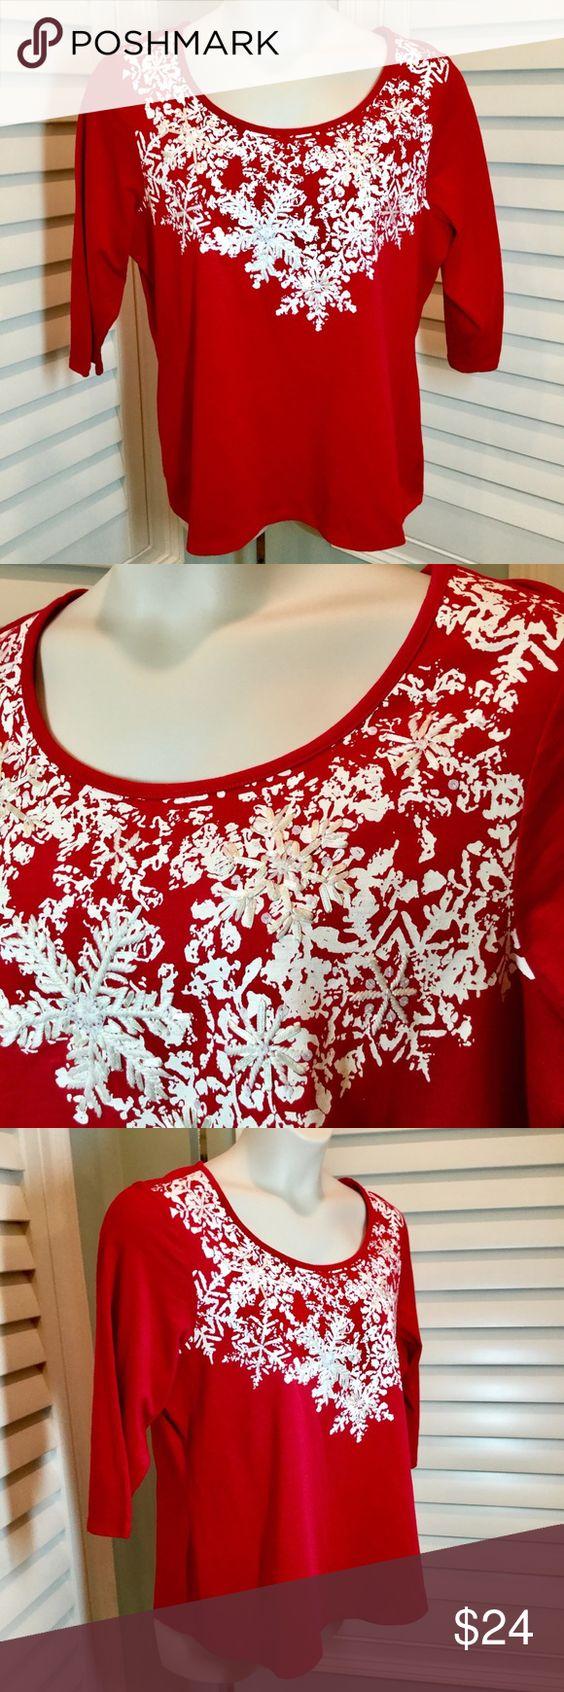 Coldwater Creek Snowflake Tee 1x Euc Clothes Design Fashion Design Fashion